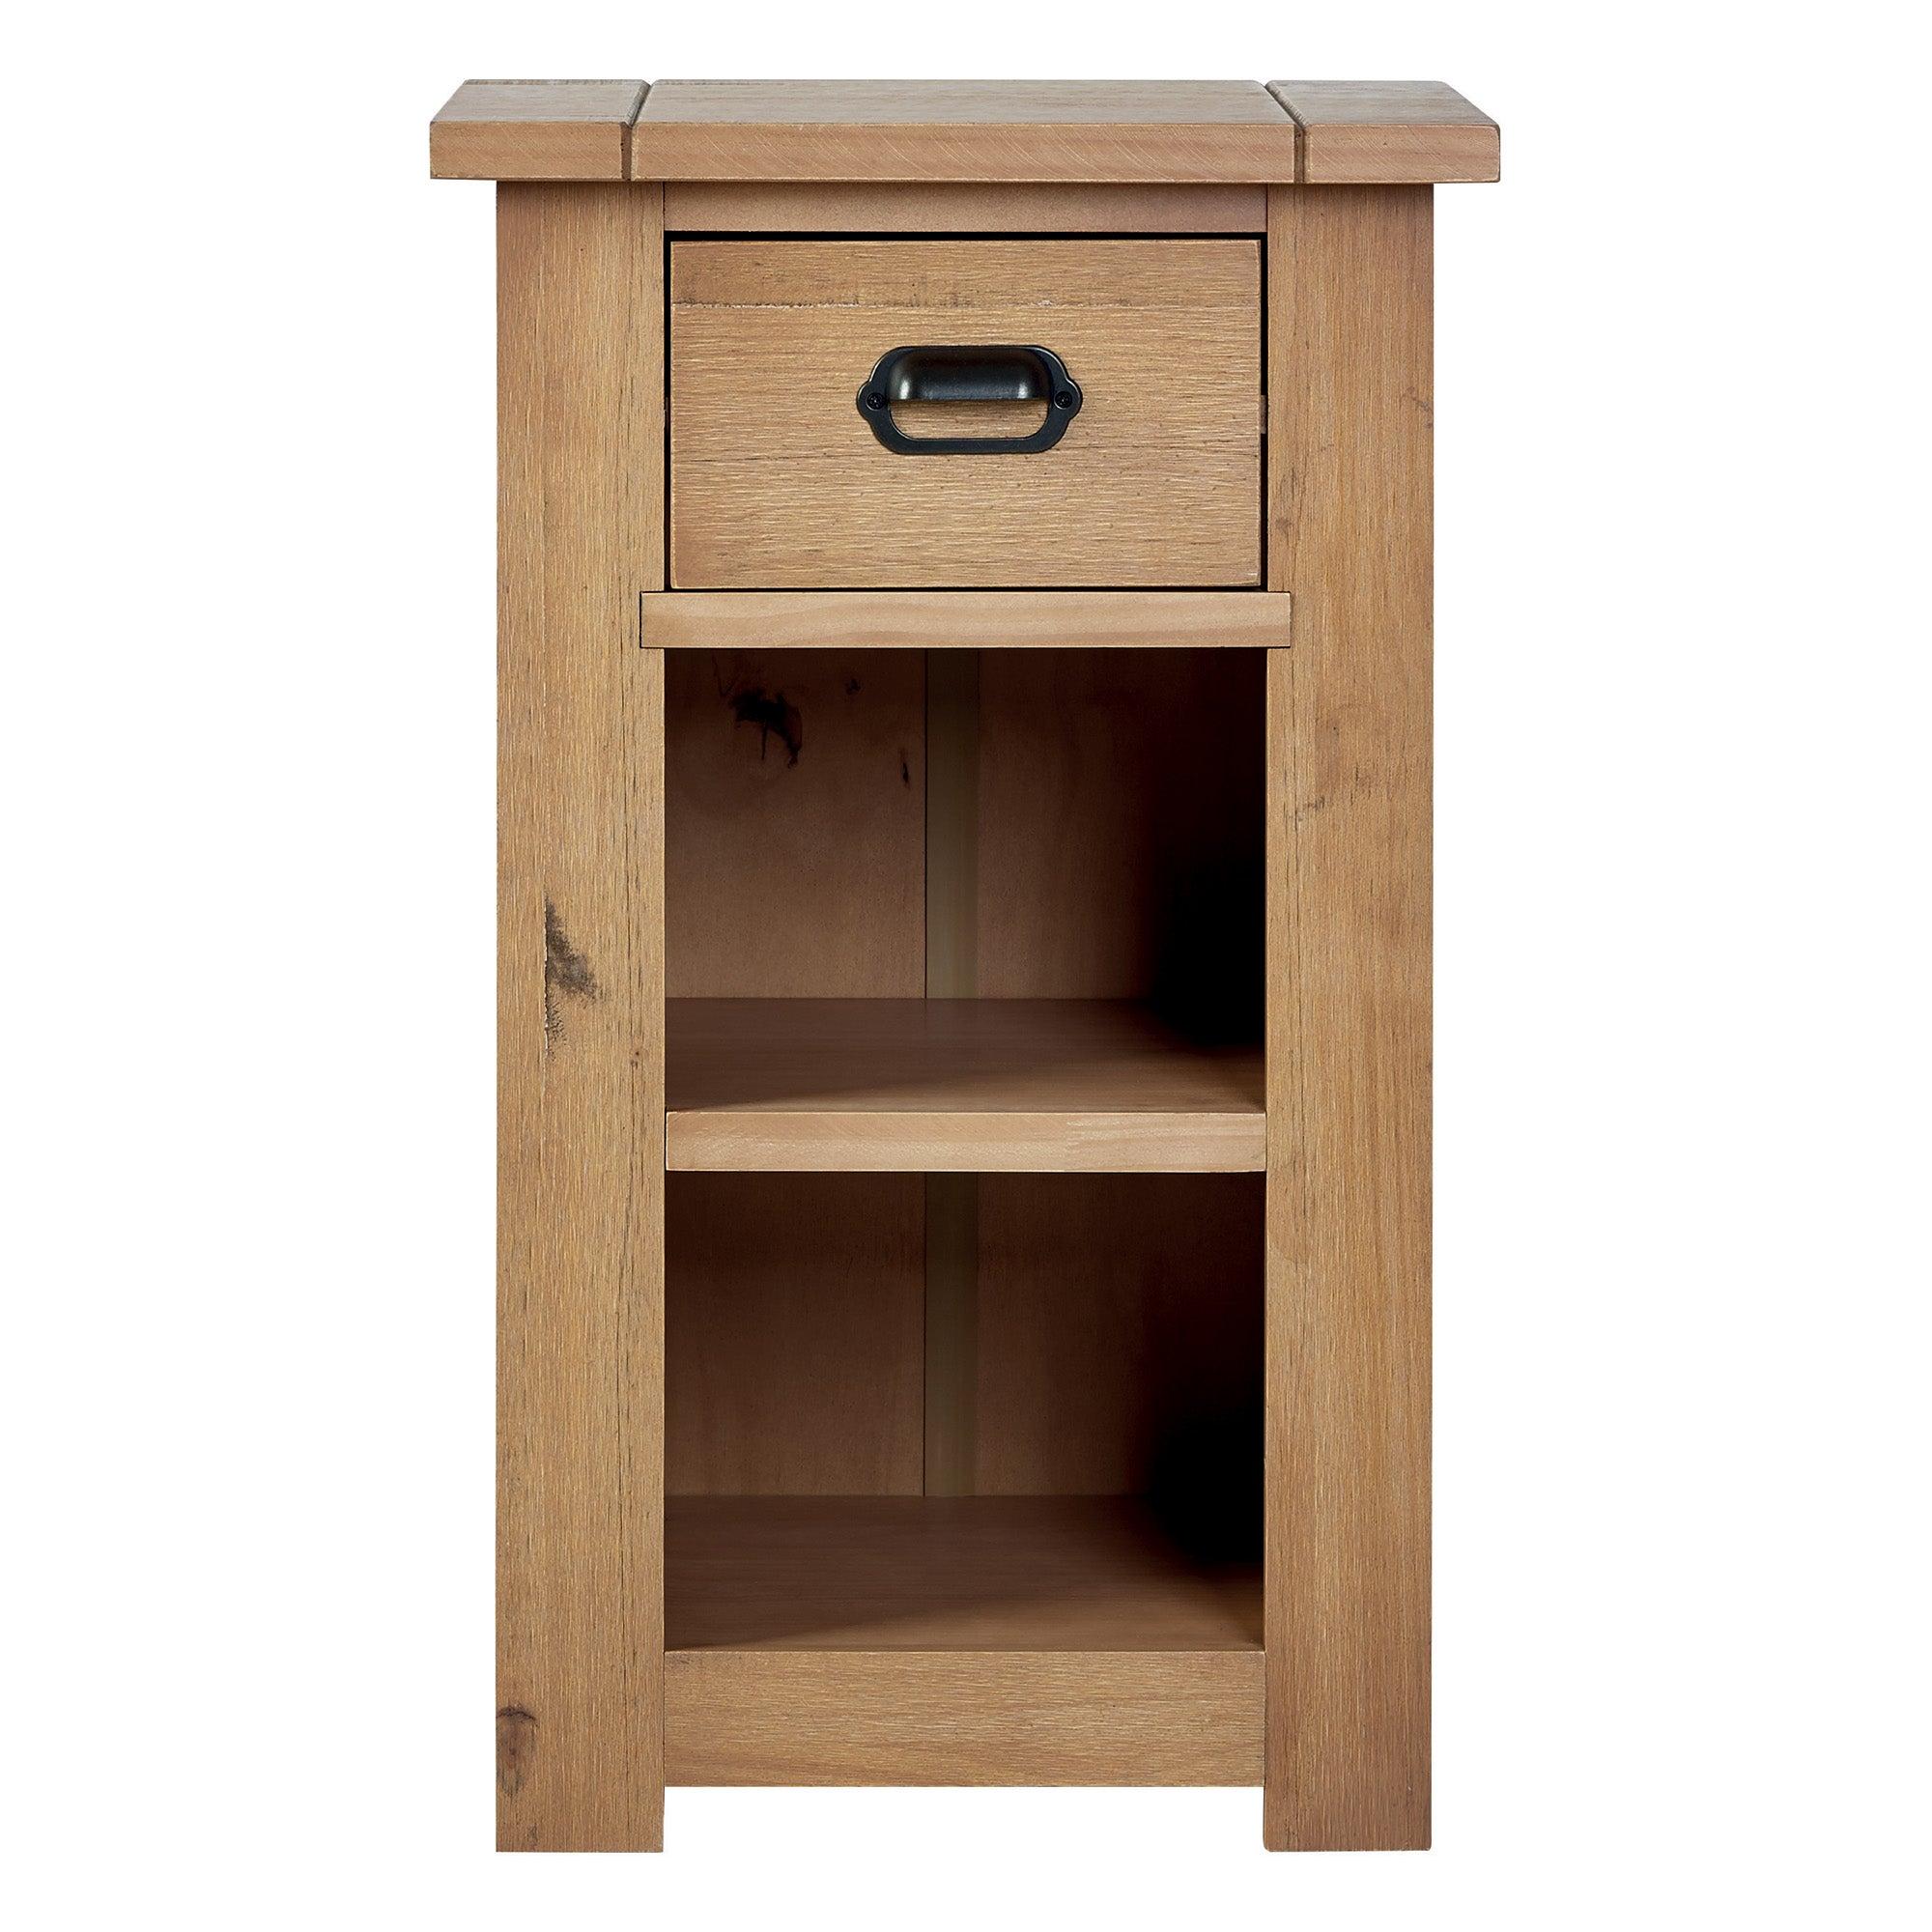 Photo of Fenton pine telephone table brown